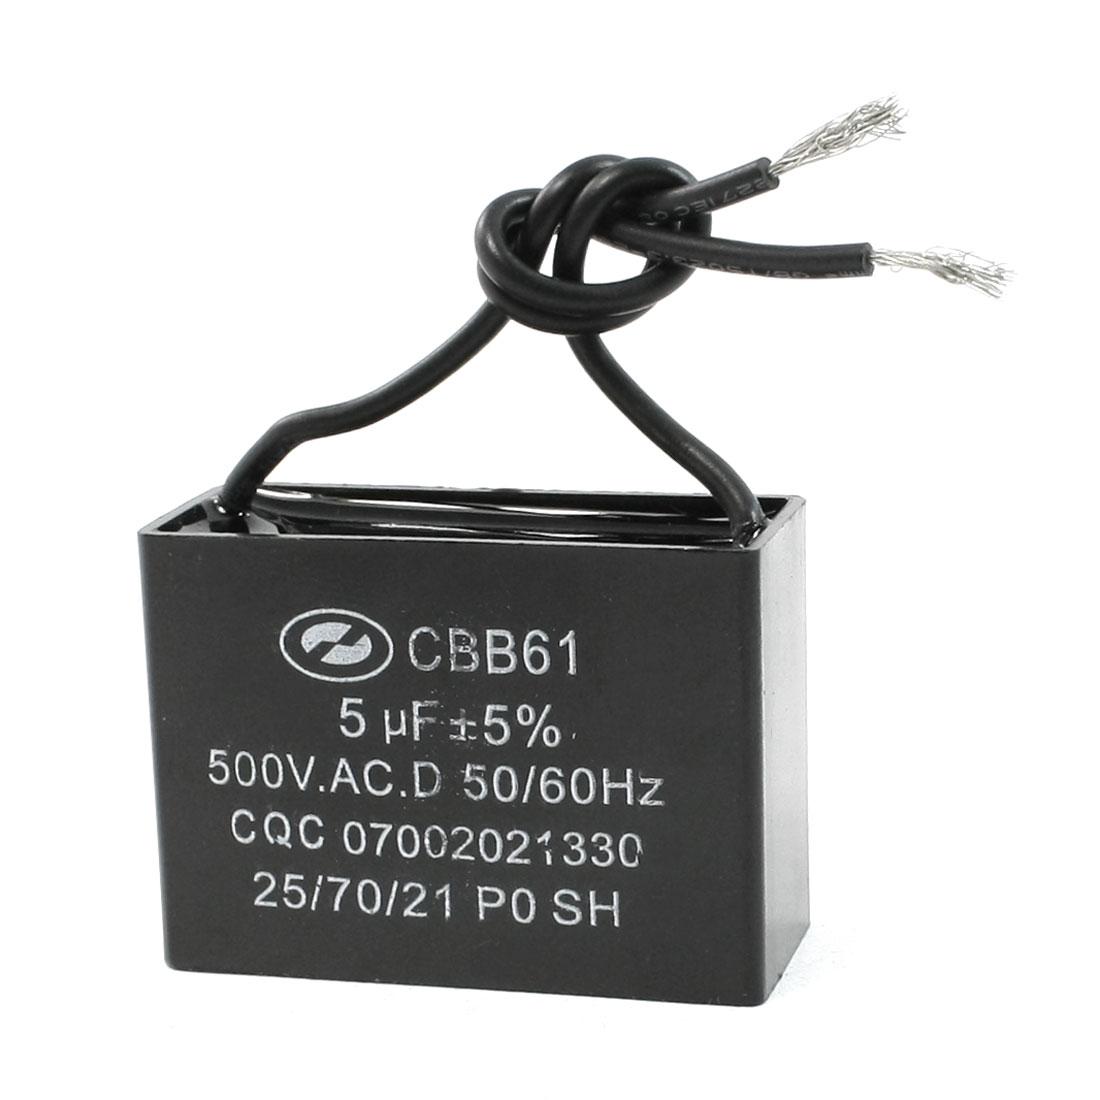 AC 500V CBB61 5uF Cuboid Polypropylene Film Motor Capacitor for Fan